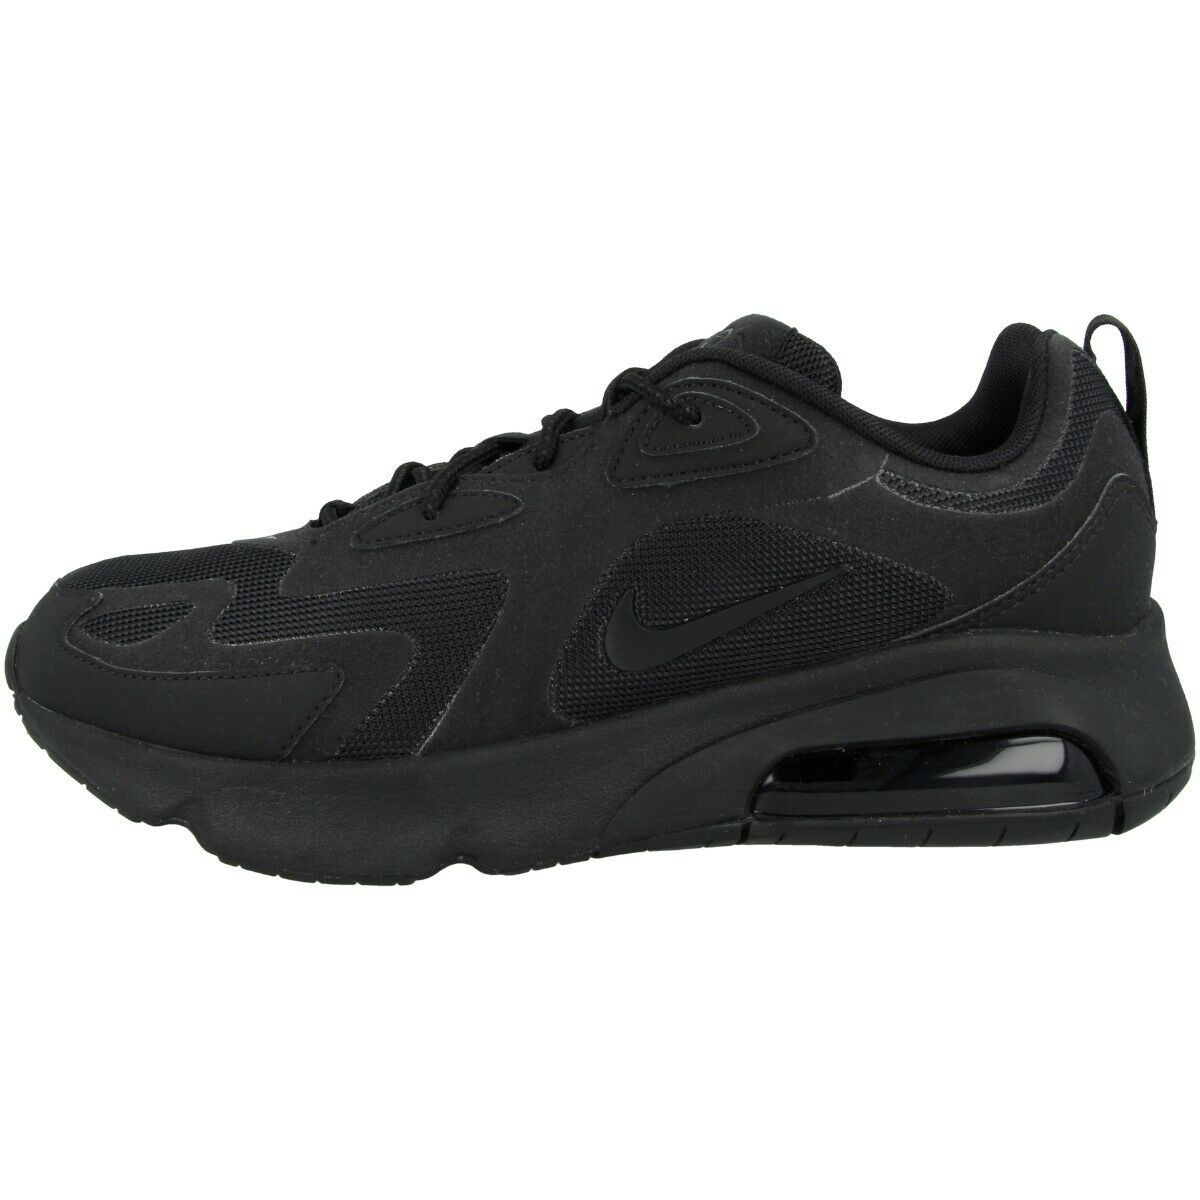 Nike Air Max 200 Women Schuhe Damen Freizeit Sneaker Turnschuhe black AT6175-003